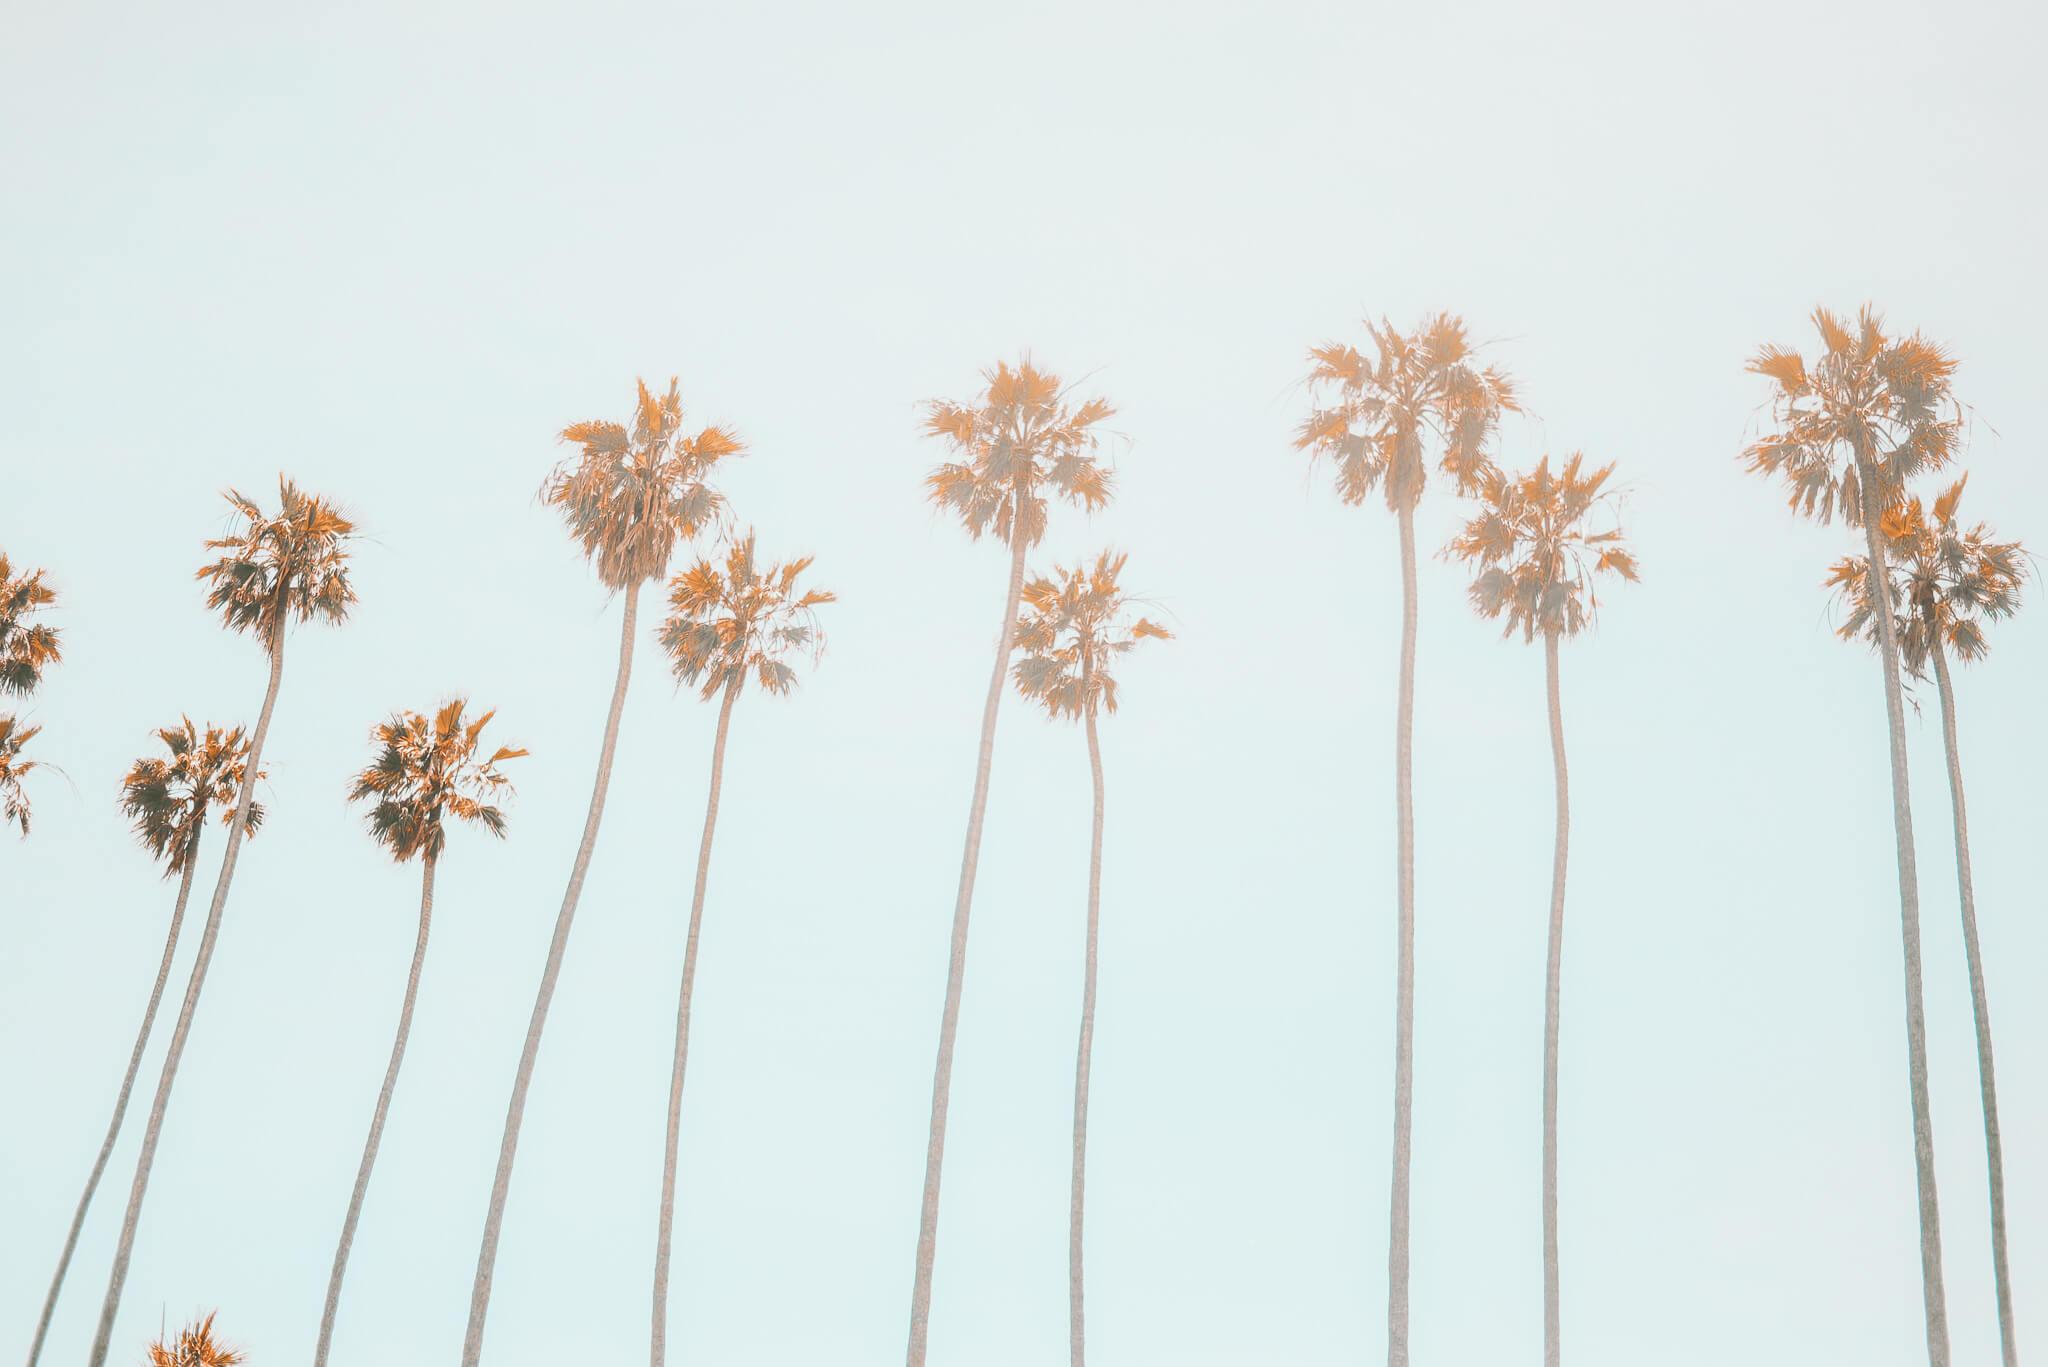 Palm trees with a blue sky.